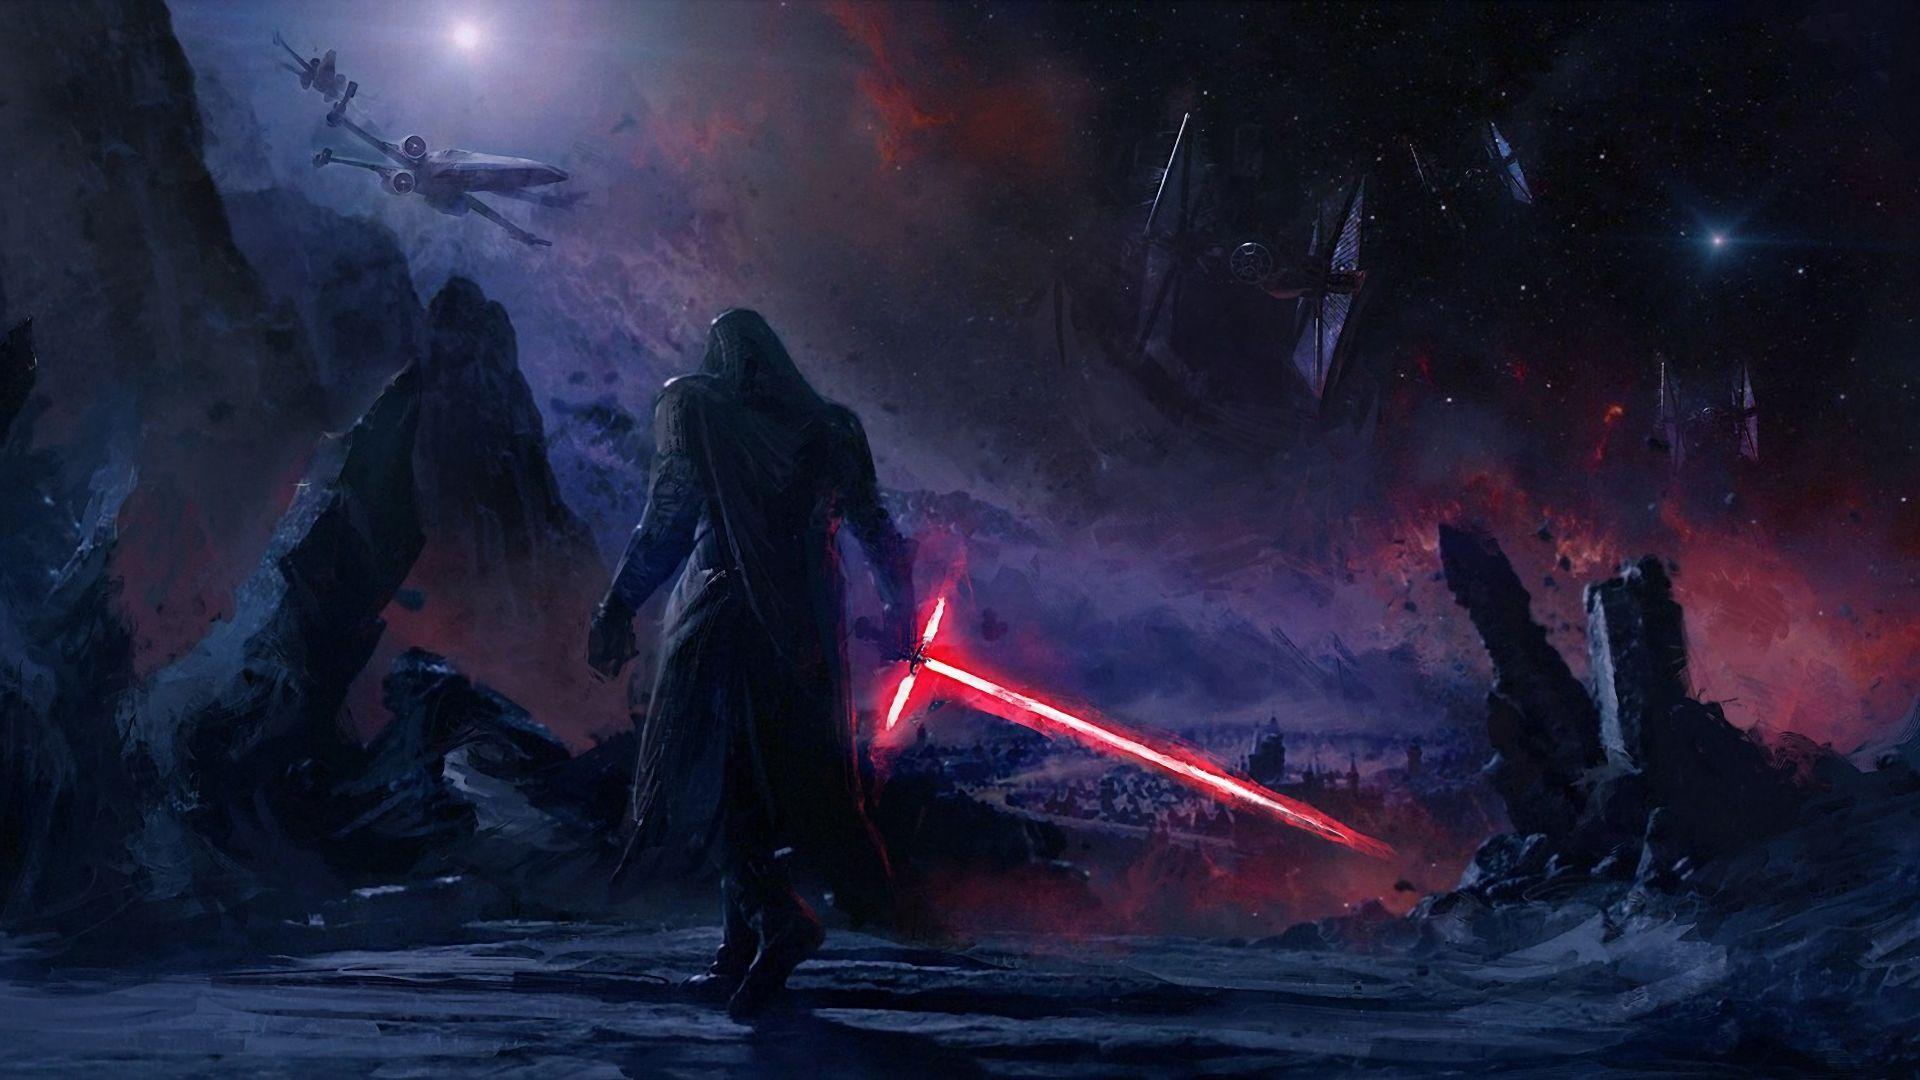 Star Wars Artwork Wallpapers Top Free Star Wars Artwork Backgrounds Wallpaperaccess